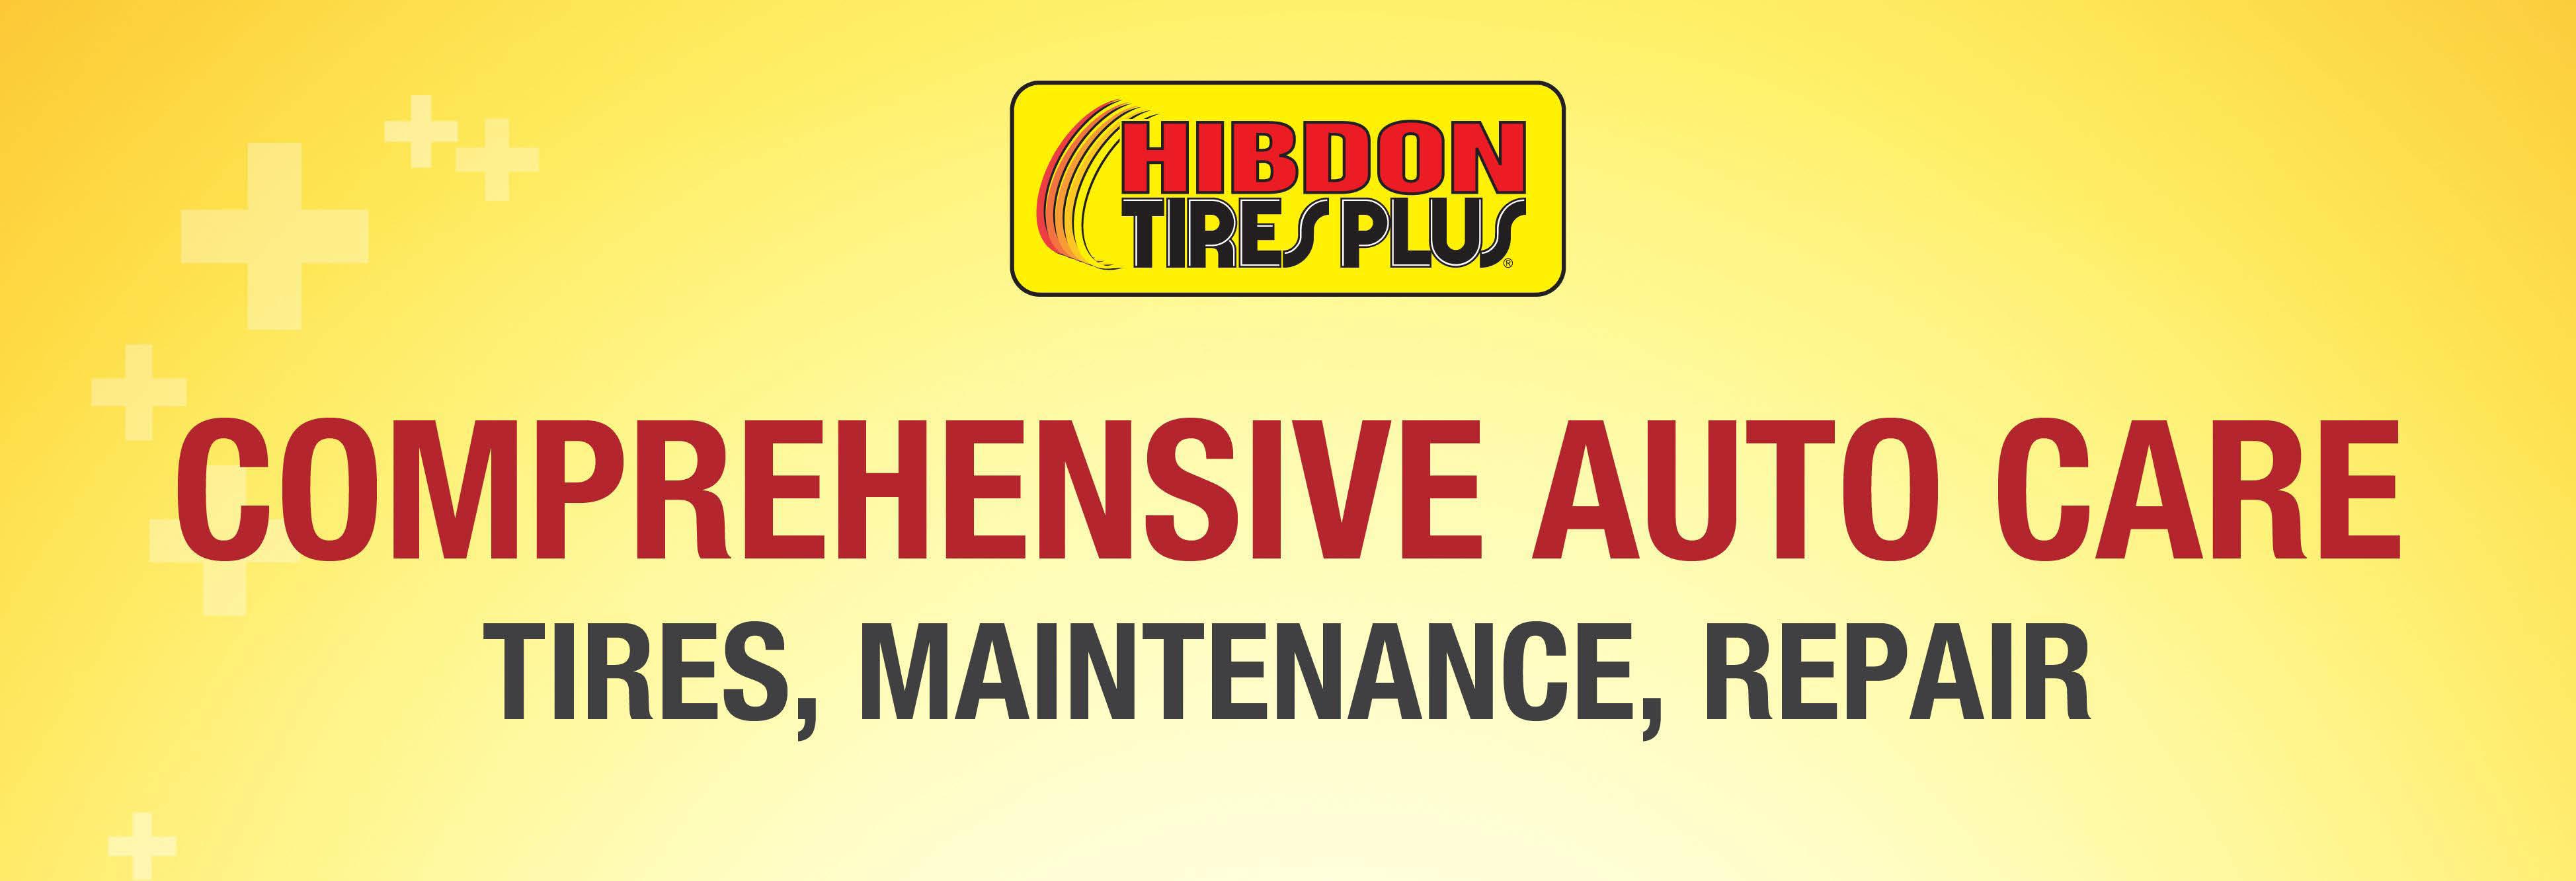 hibdon tires credit card payment | mamiihondenk.org